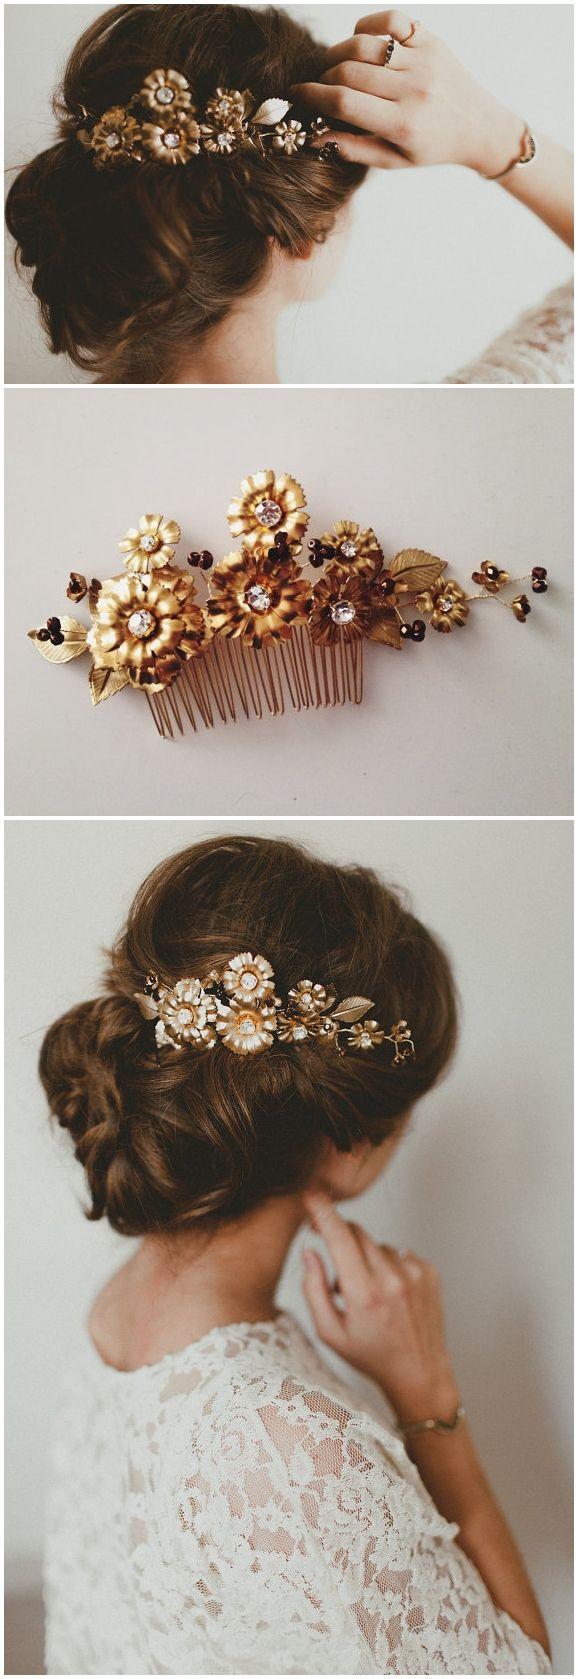 Wddding hairstyles La Marguerite comb, #1308